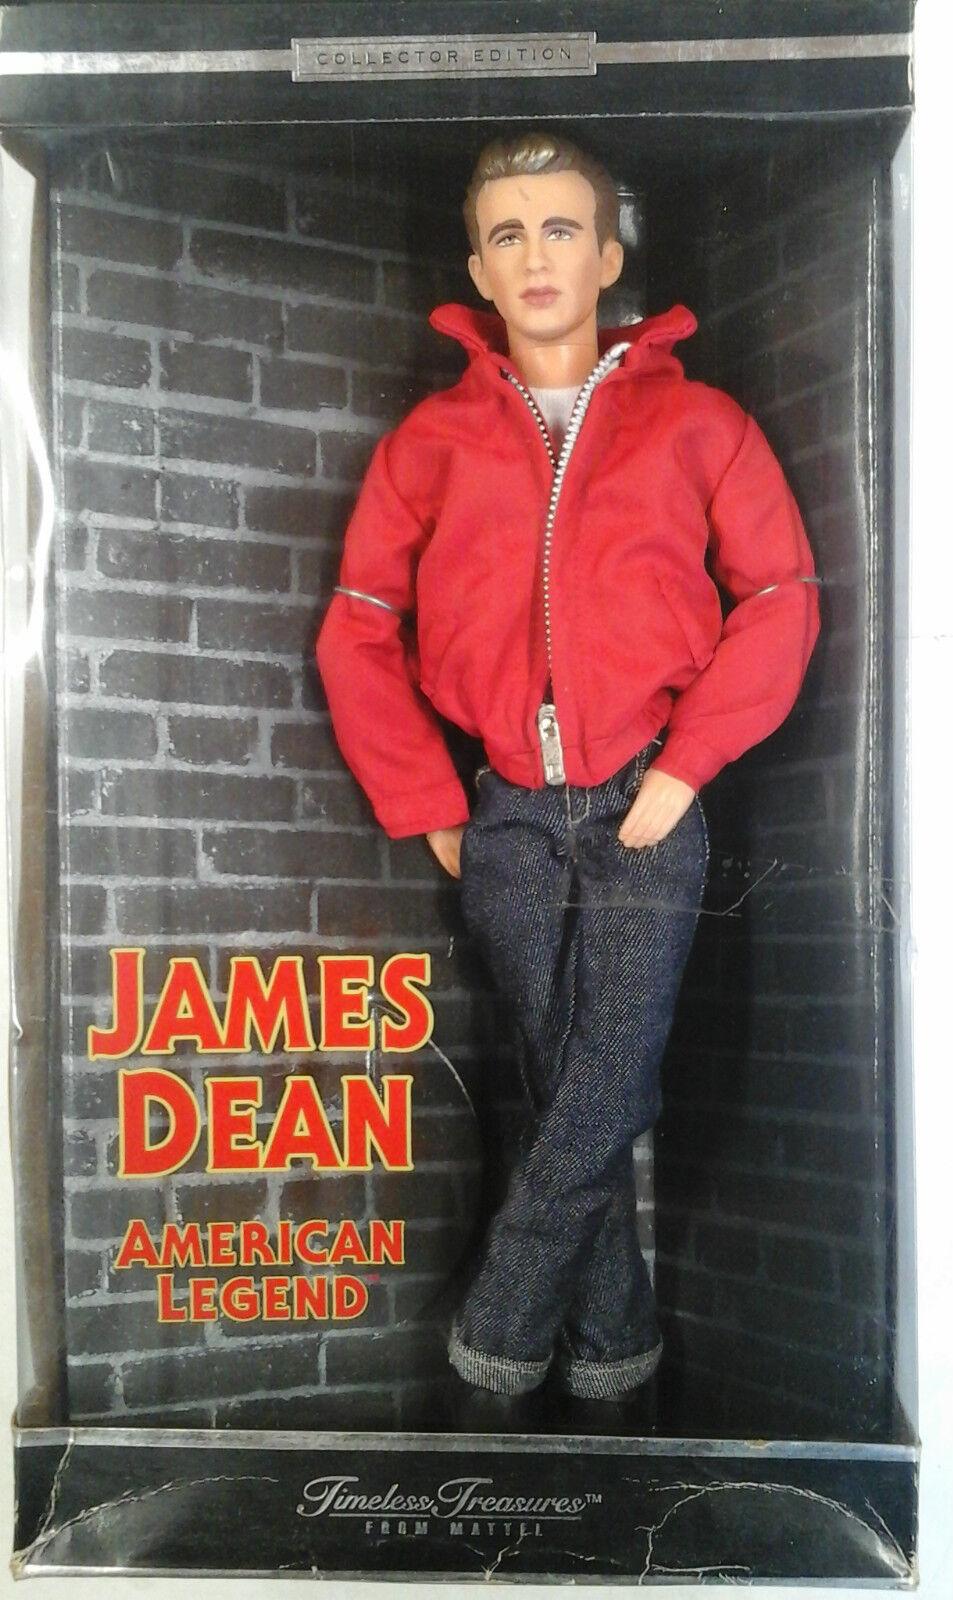 BARBIE - 2000 - JAMES DEAN DEAN DEAN - AMERICAN LEGEND - MATTEL a88eb8